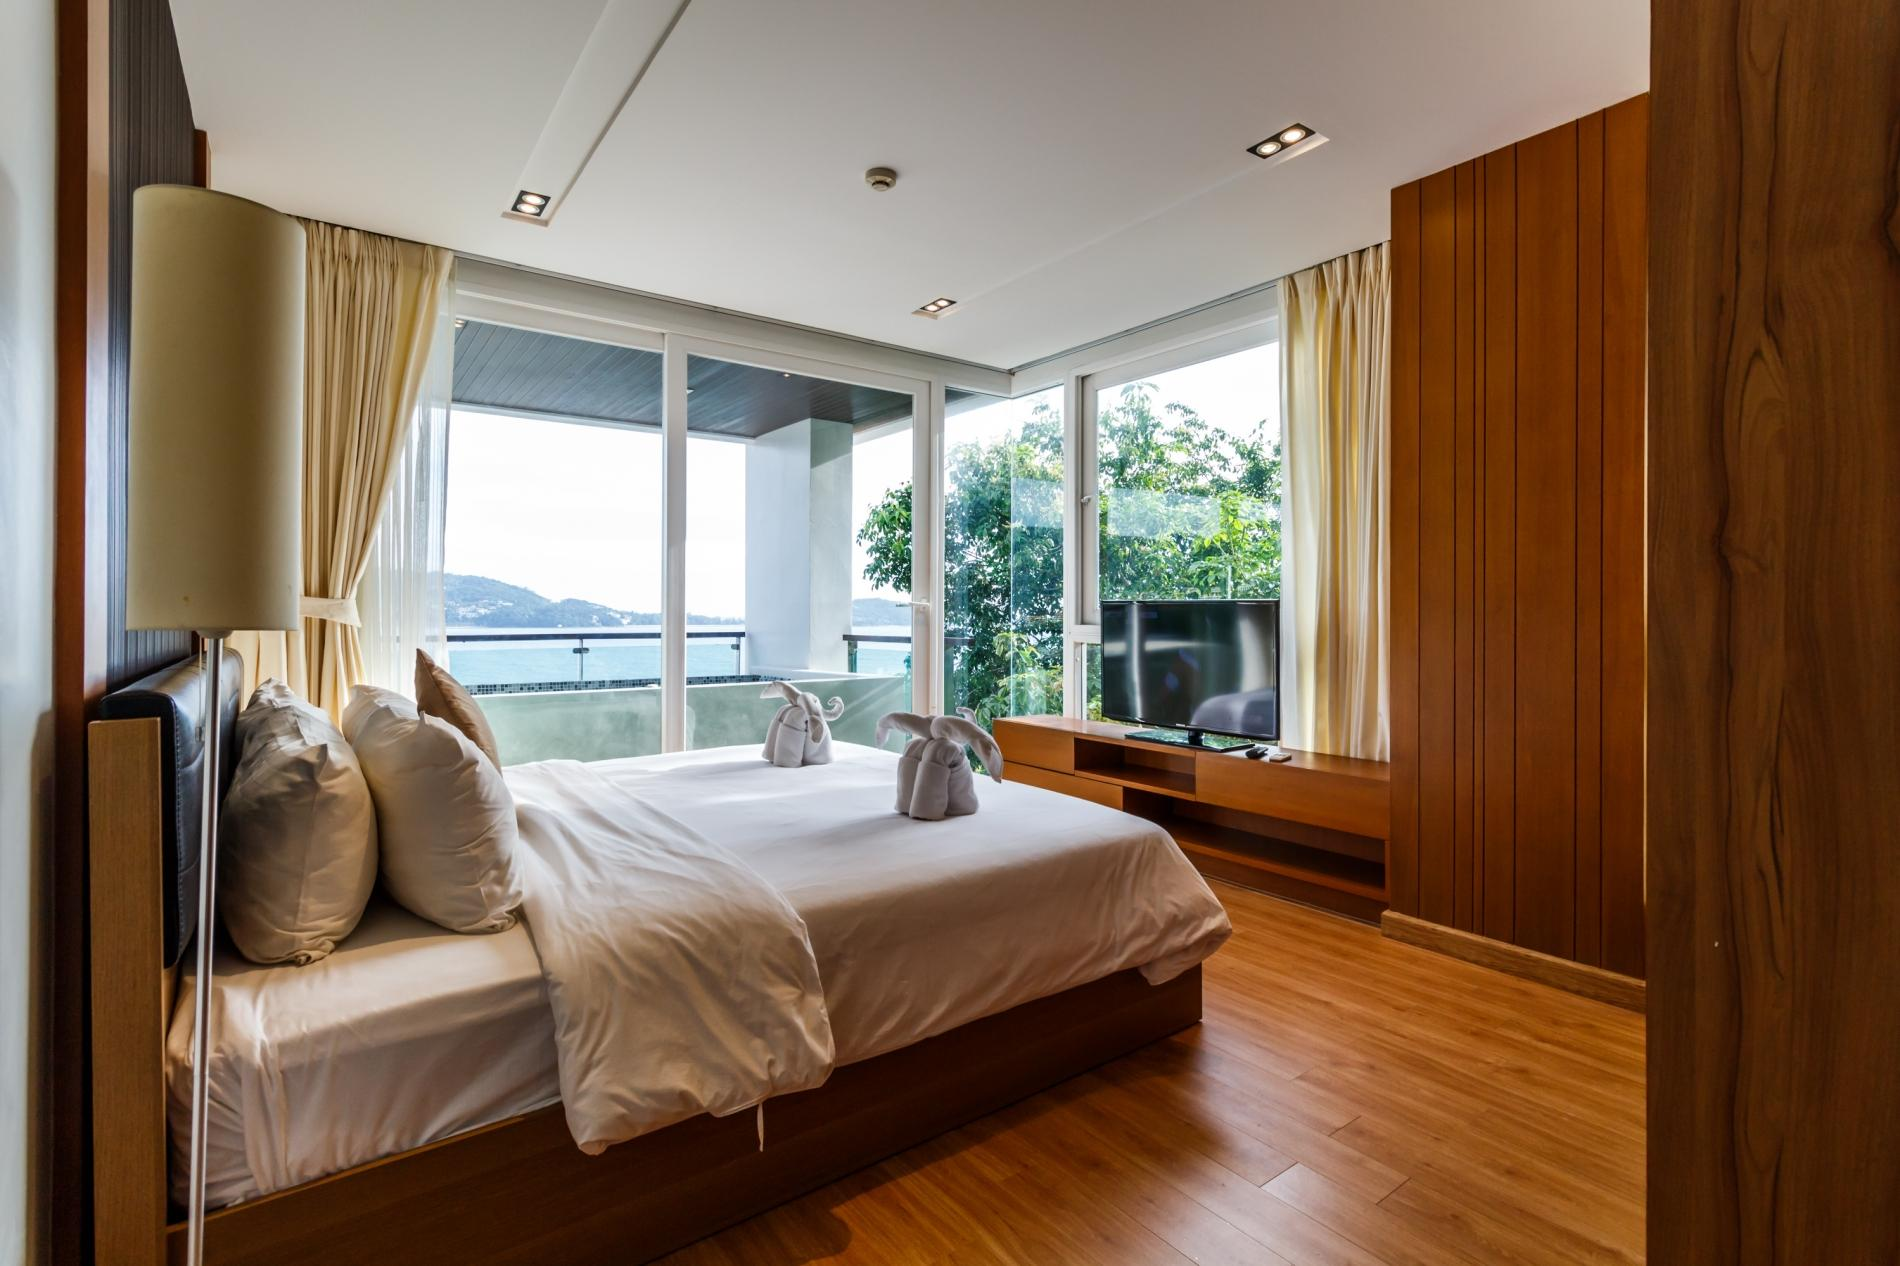 Apartment Privilege12 - Seaview 3 bedroom luxury apartment on Kalim bay photo 20319625